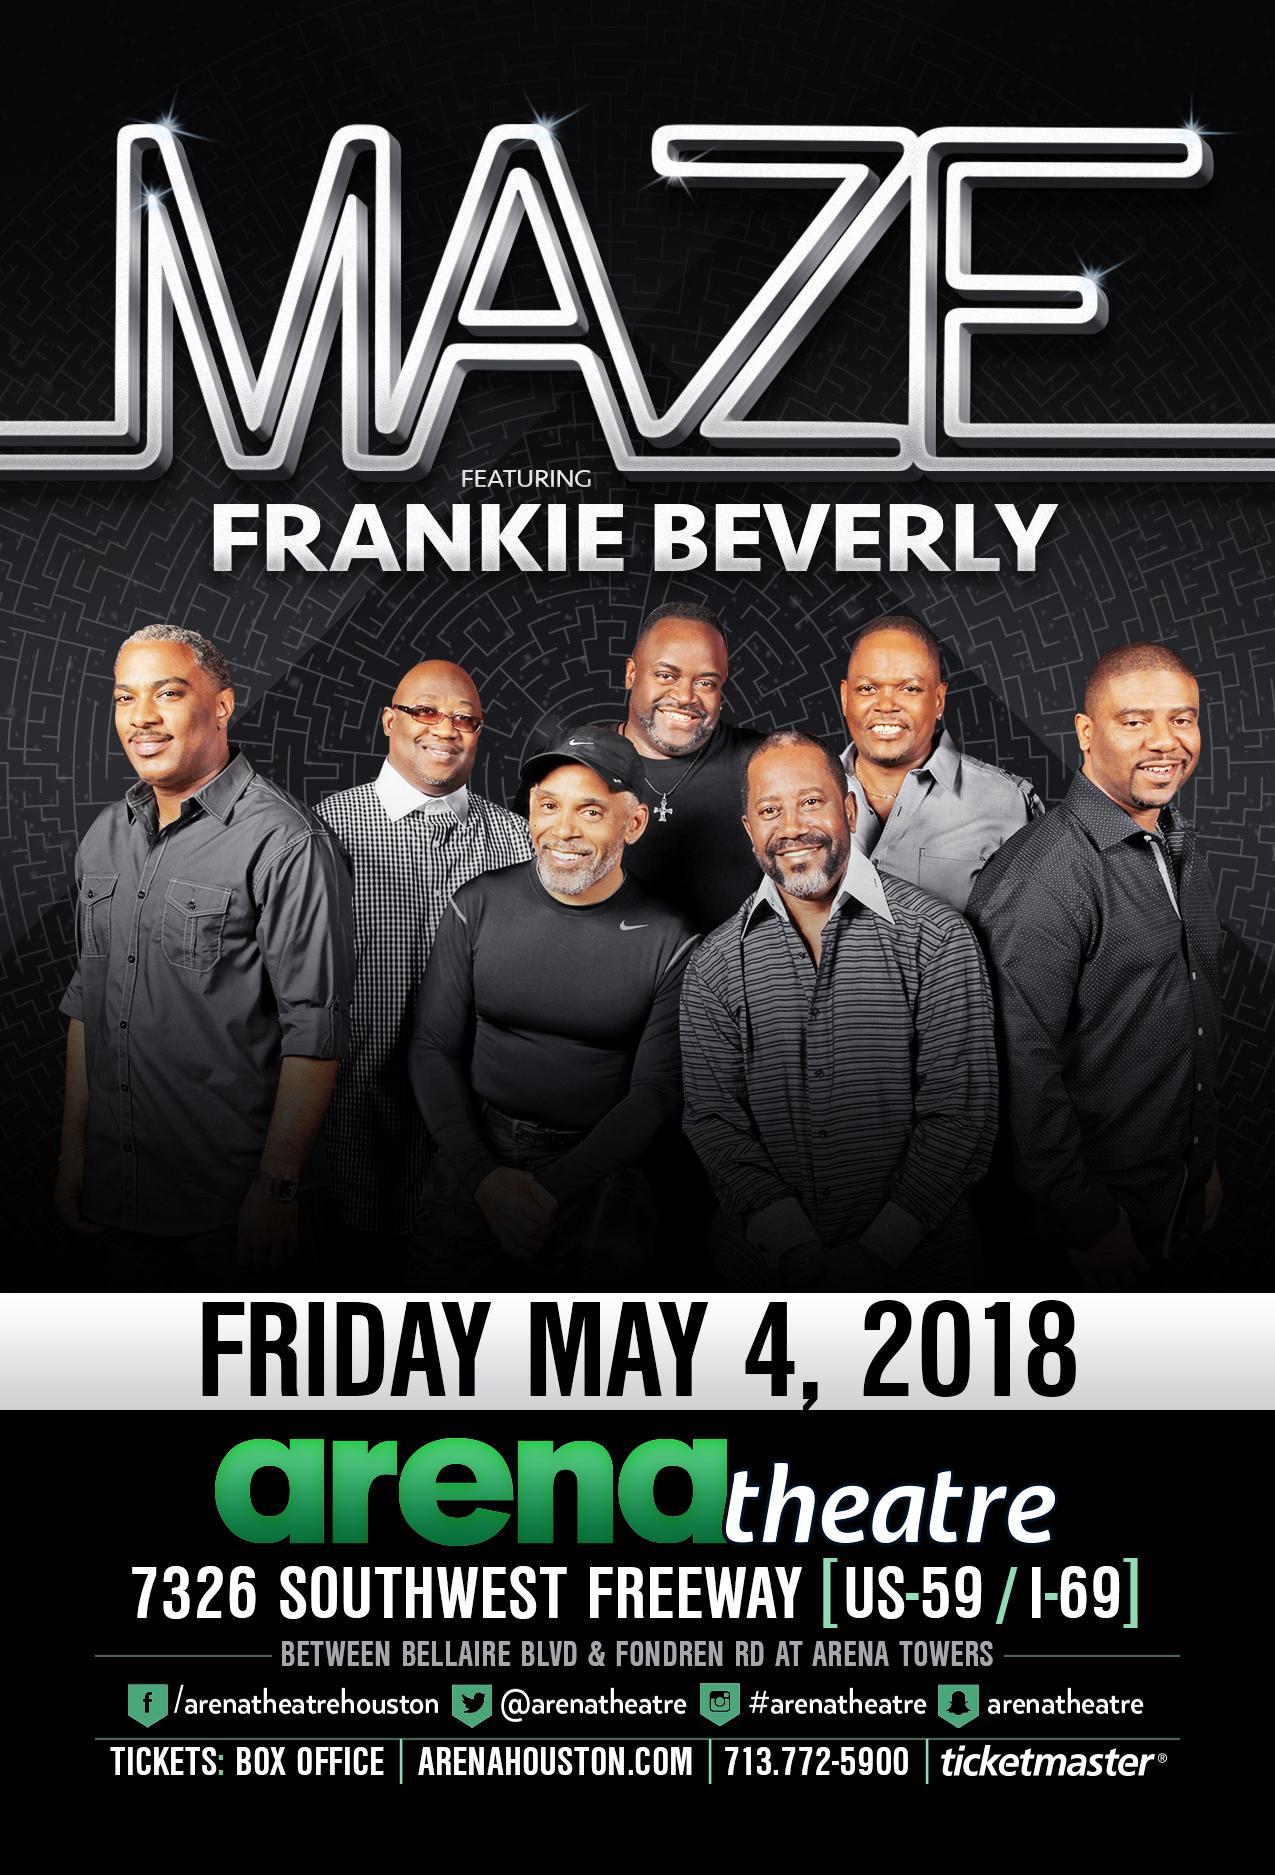 Majic 102.1 & Arena Theatre